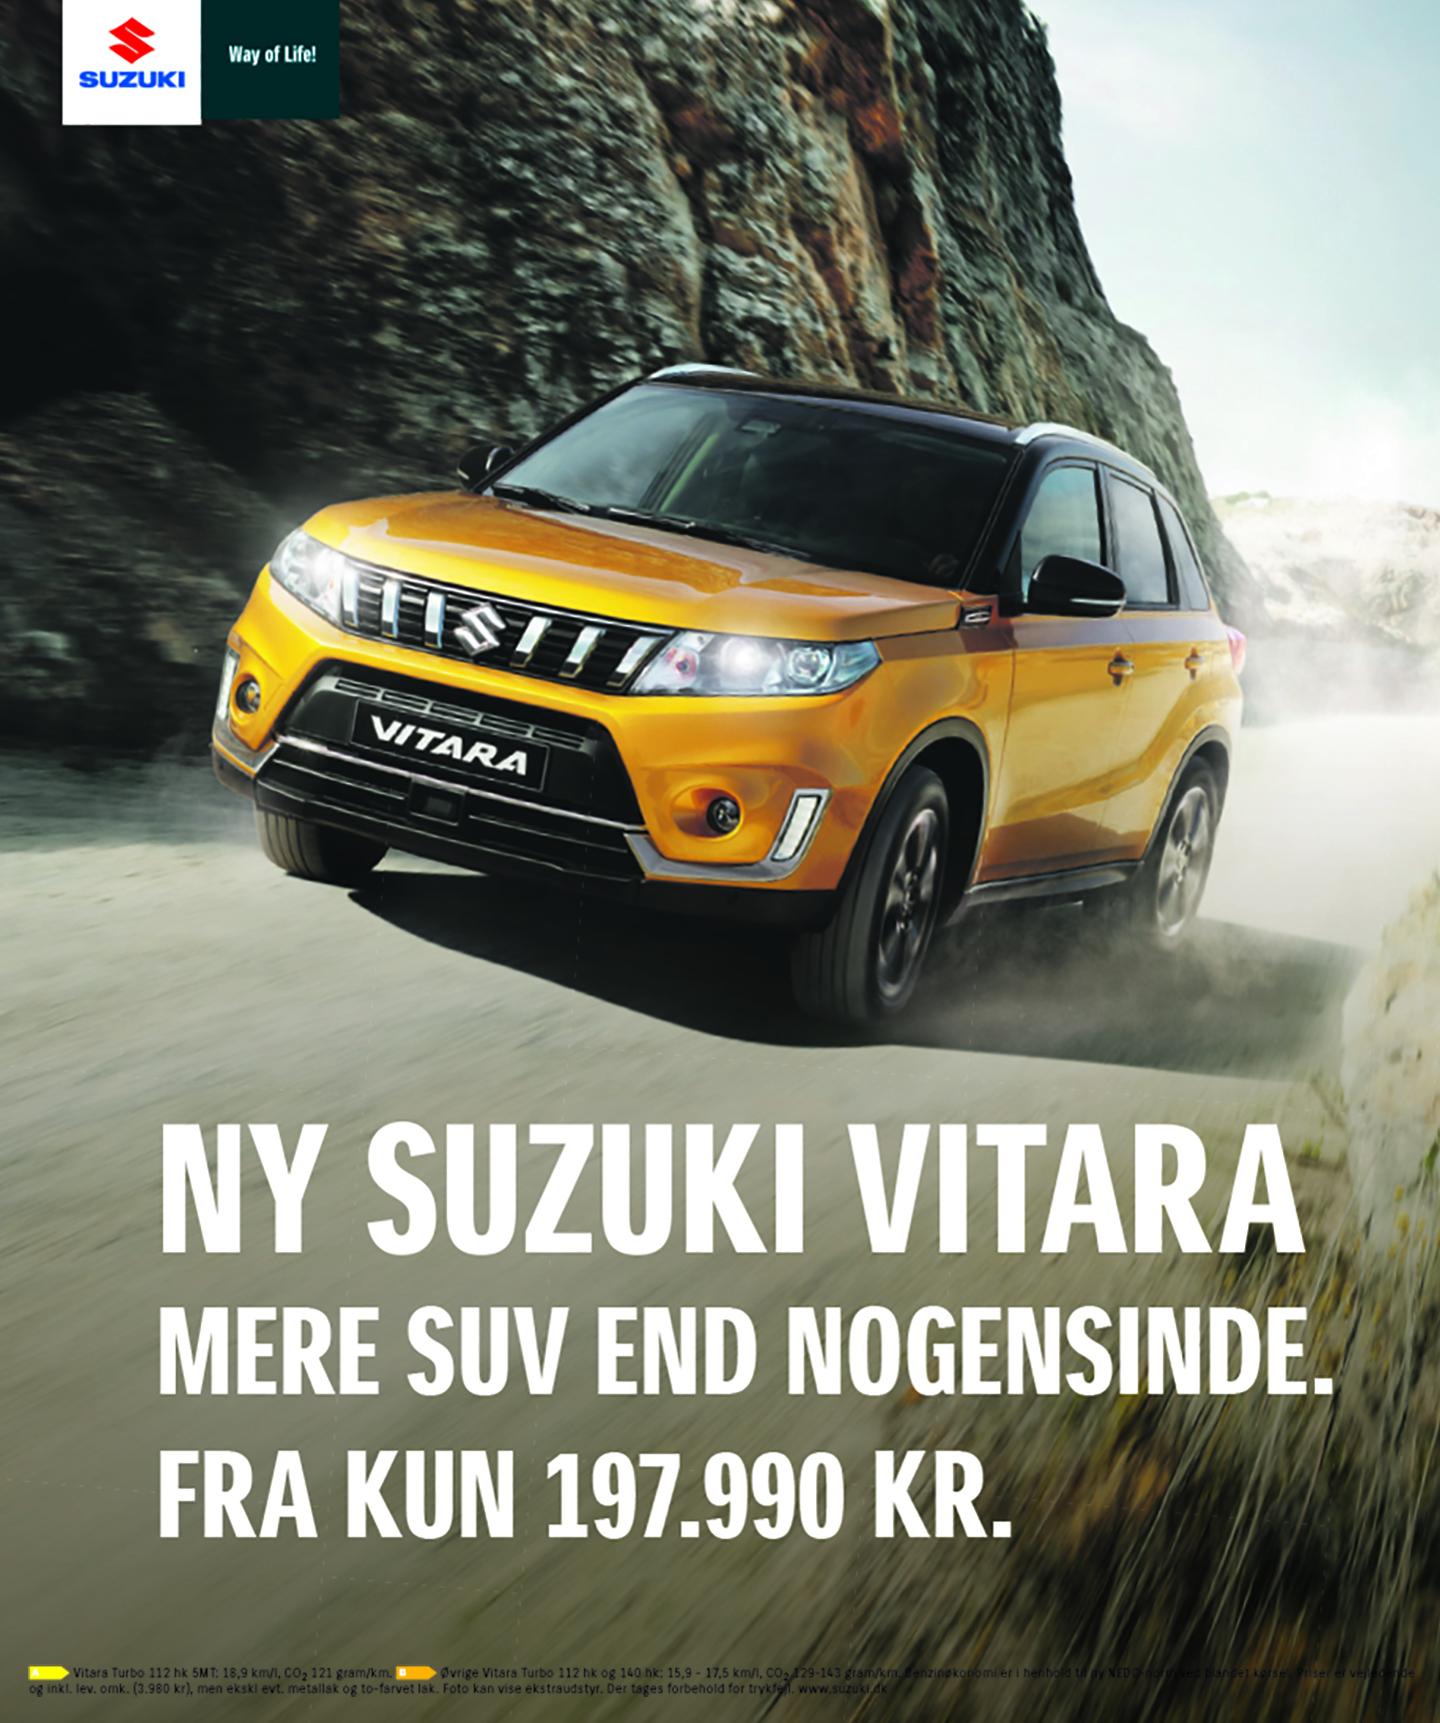 Vi er klar med den nye Suzuki Vitara